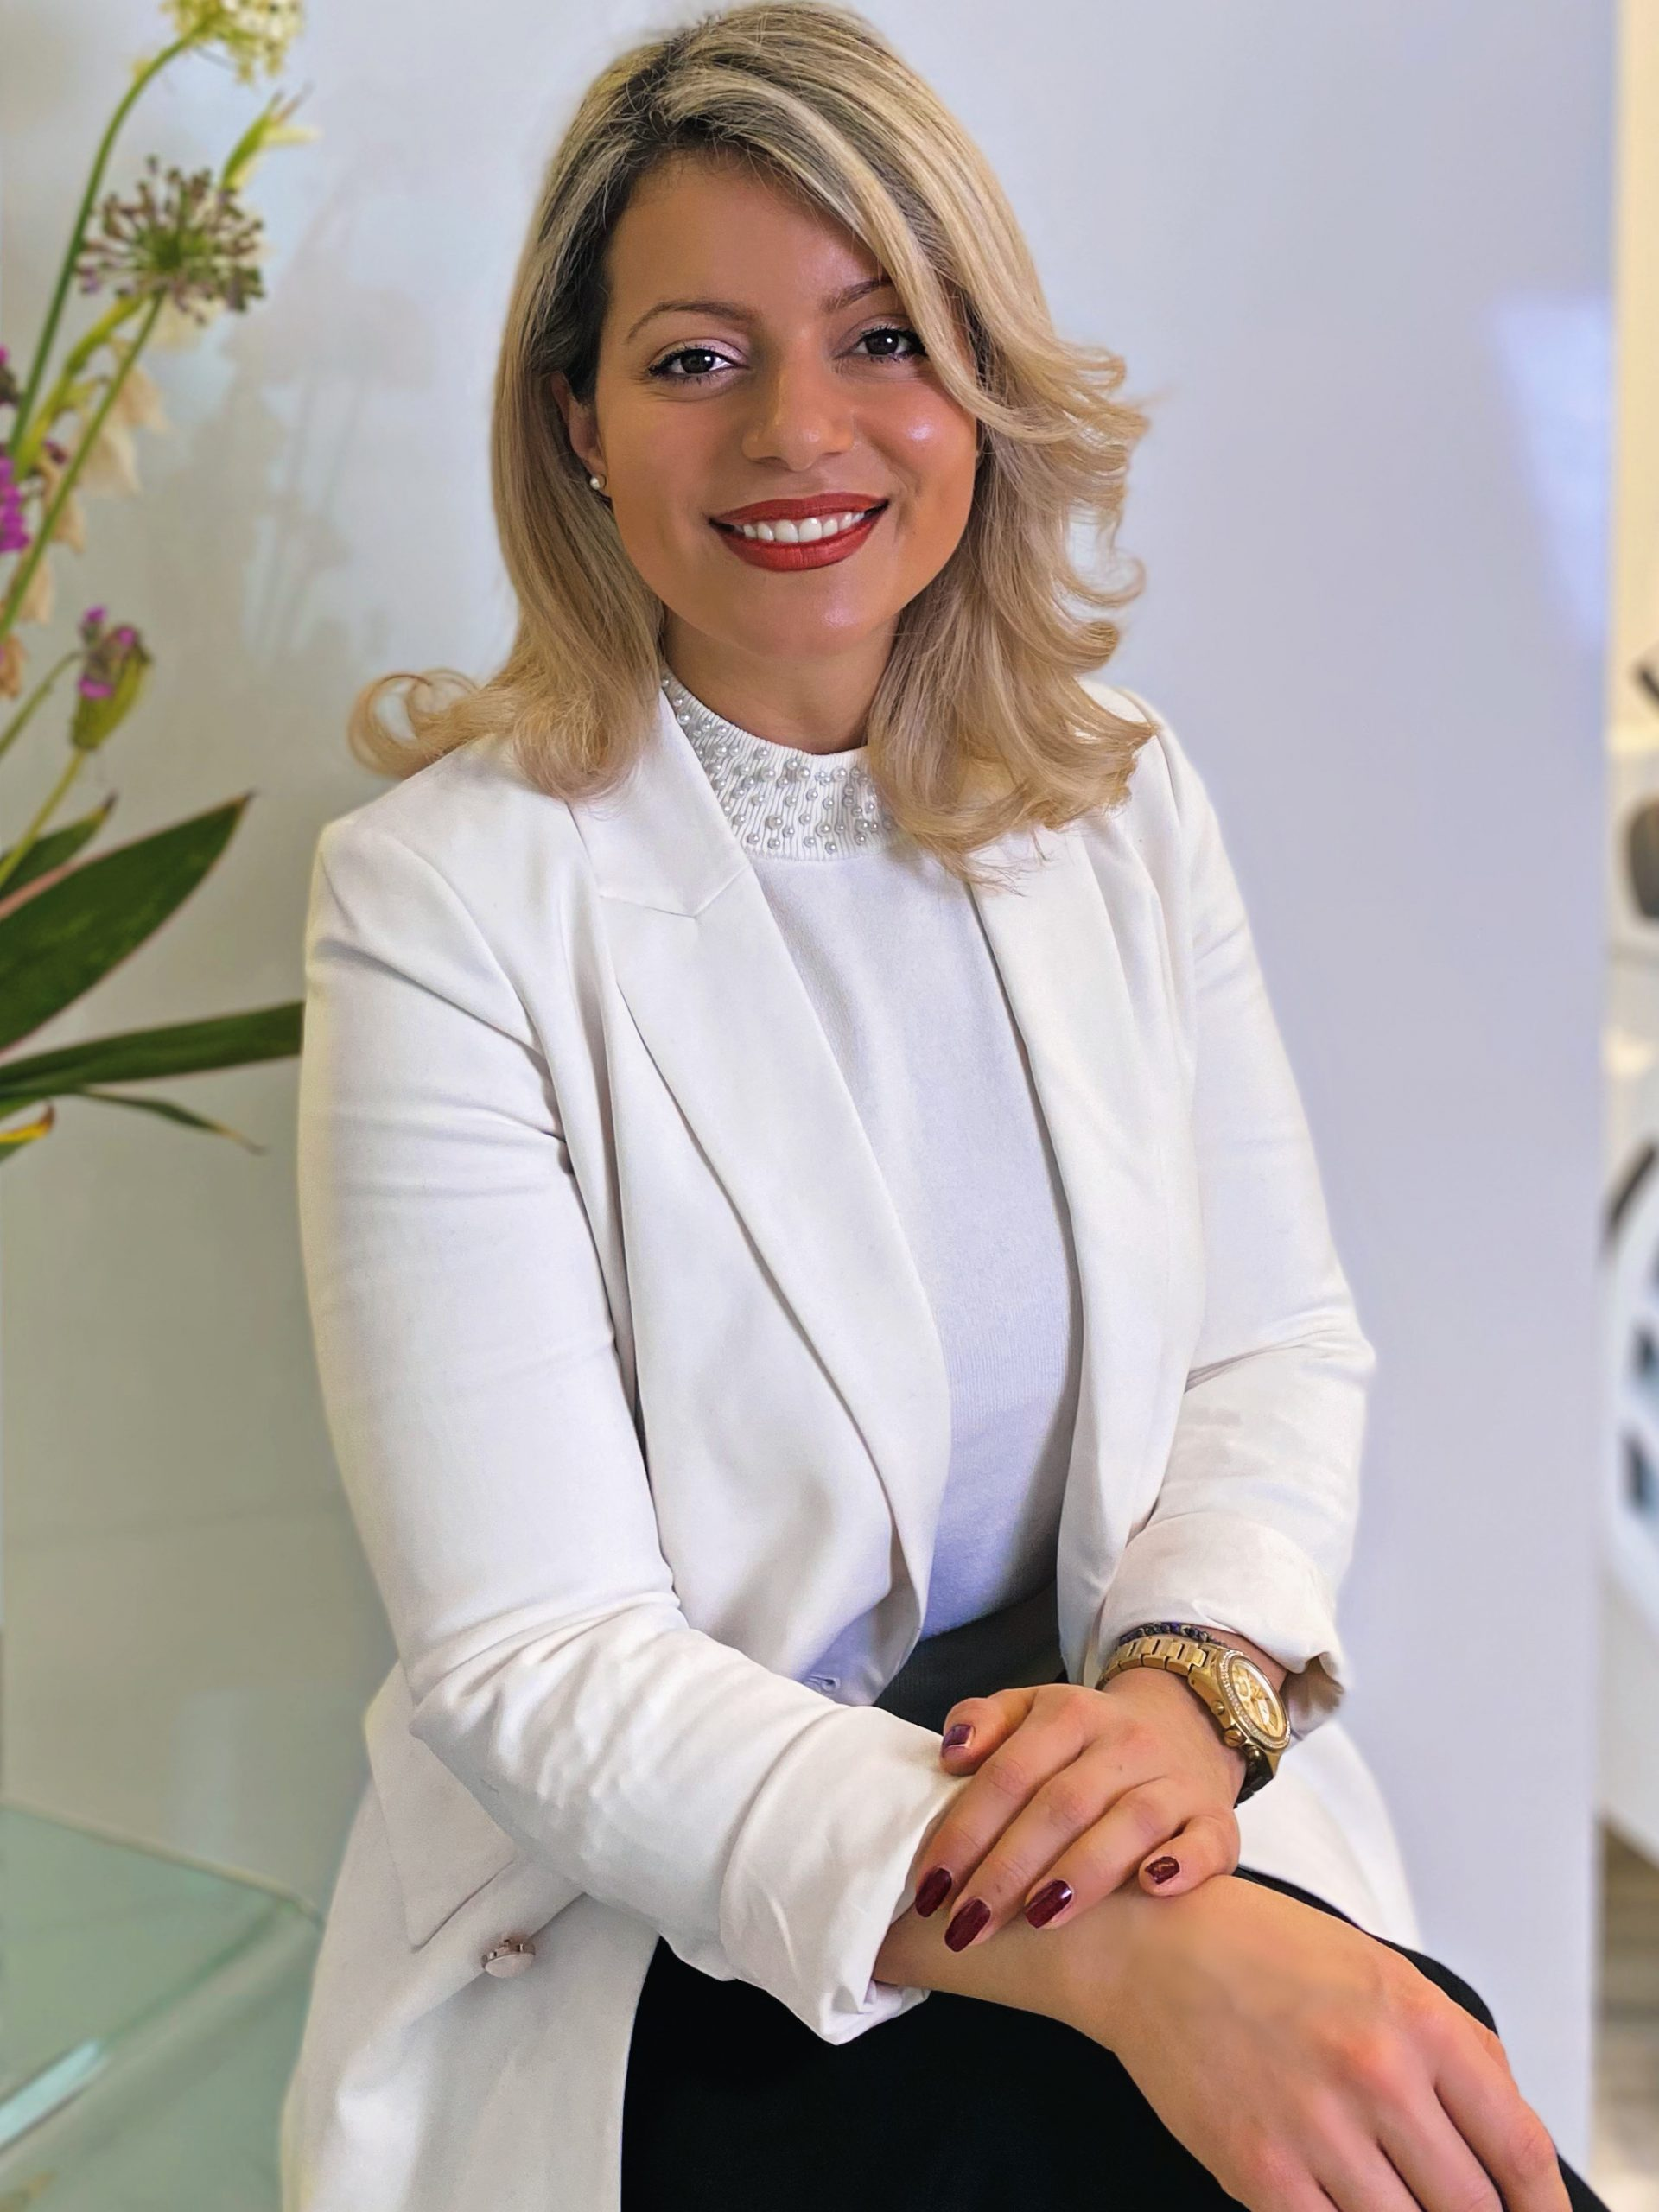 XHIRELDA VRAPI Empfang, Qualitätsmanagement